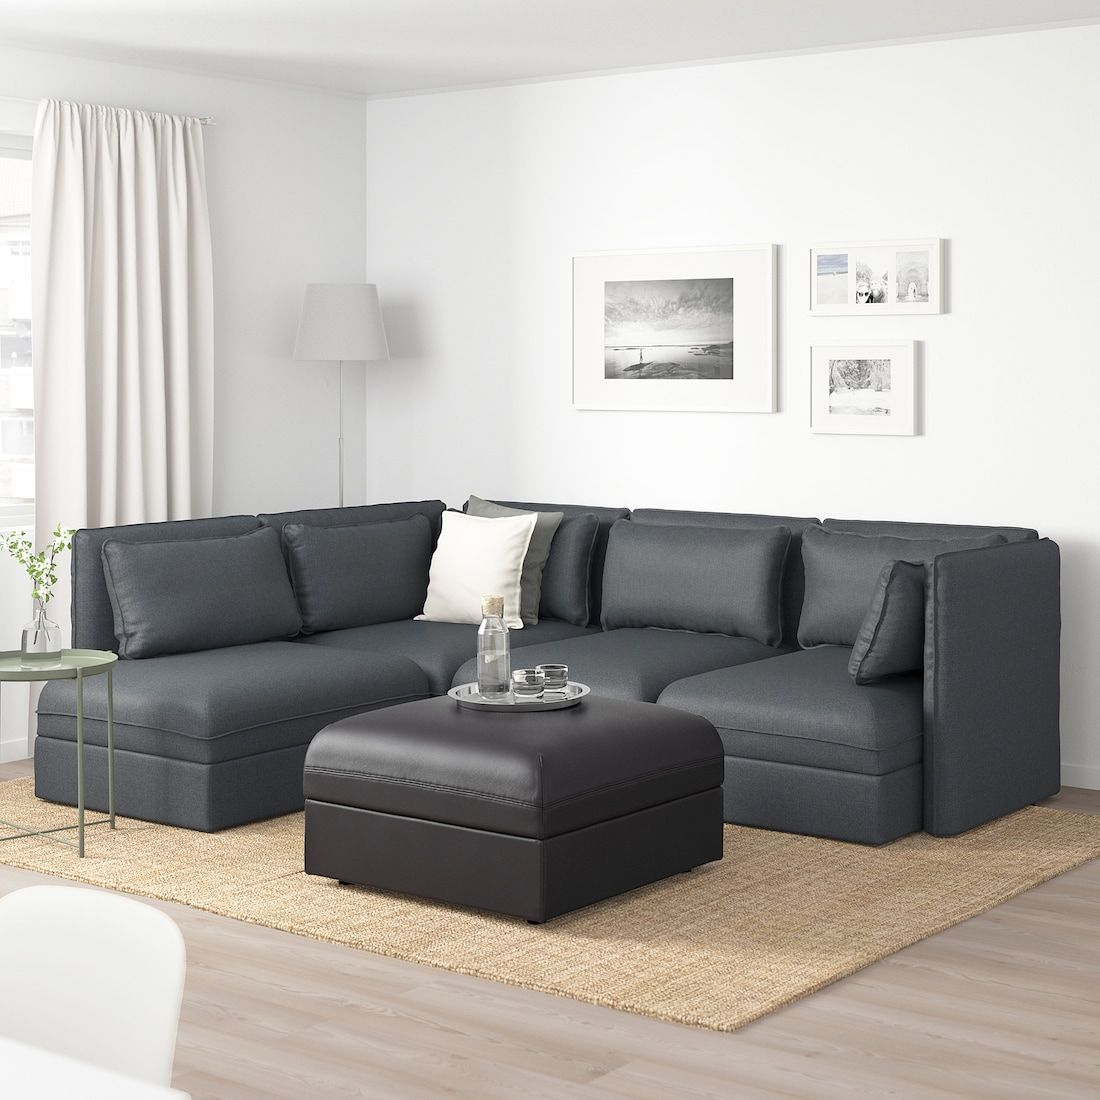 Vallentuna Modular Corner Sofa 4 Seat With Storage Hillared Murum Dark Gray Black Ikea In 2020 Modular Corner Sofa Corner Sofa Ikea